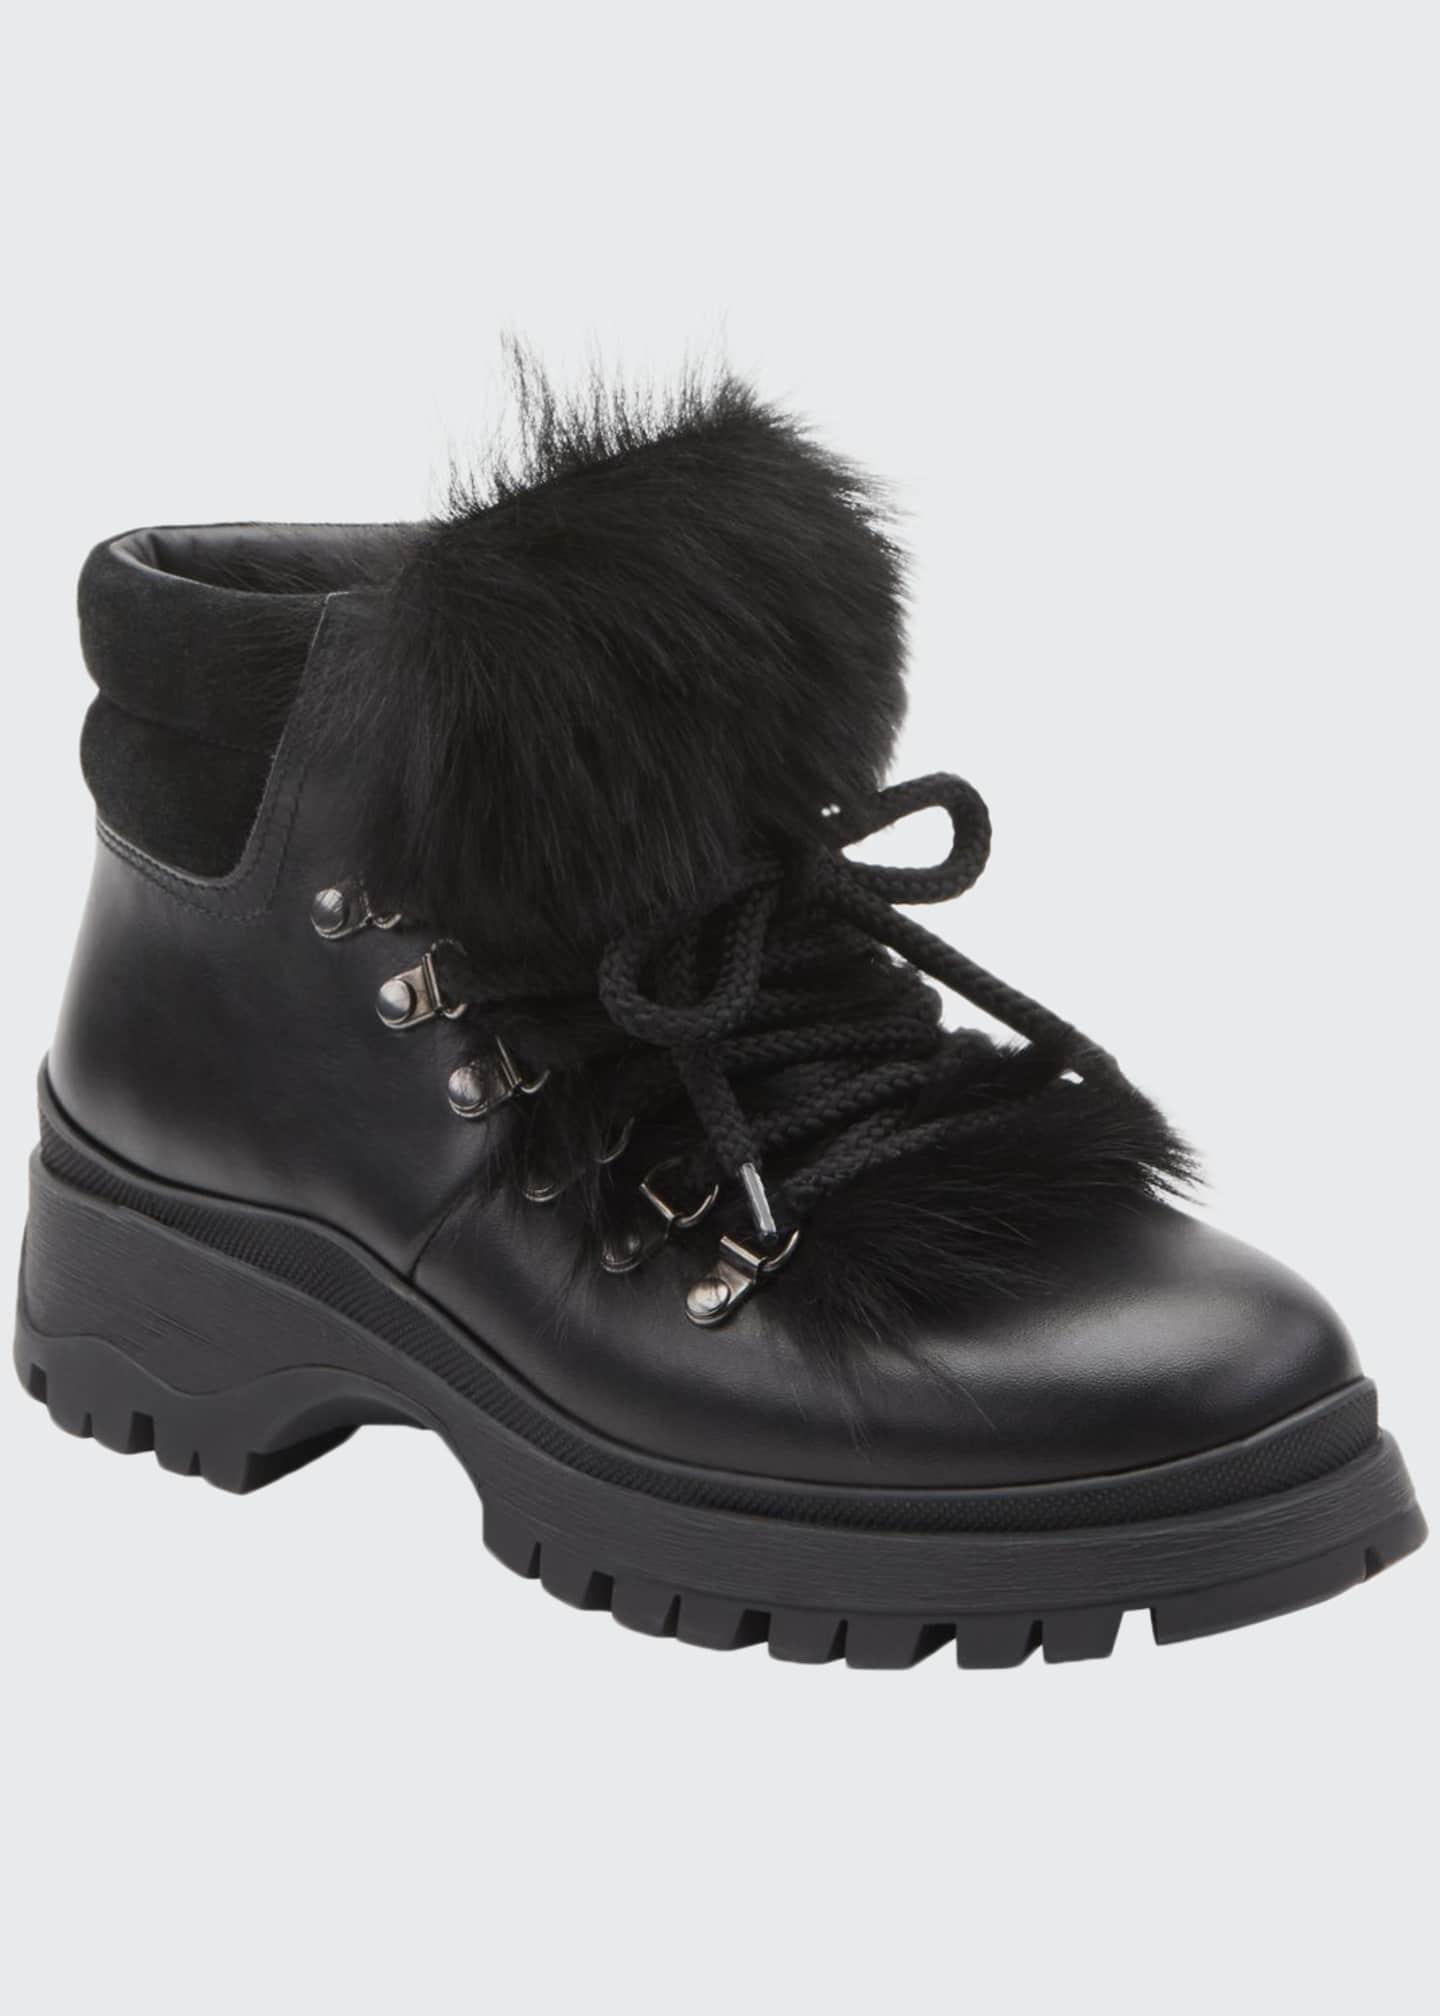 Prada Lug-Sole Hiker Boots with Fur Trim